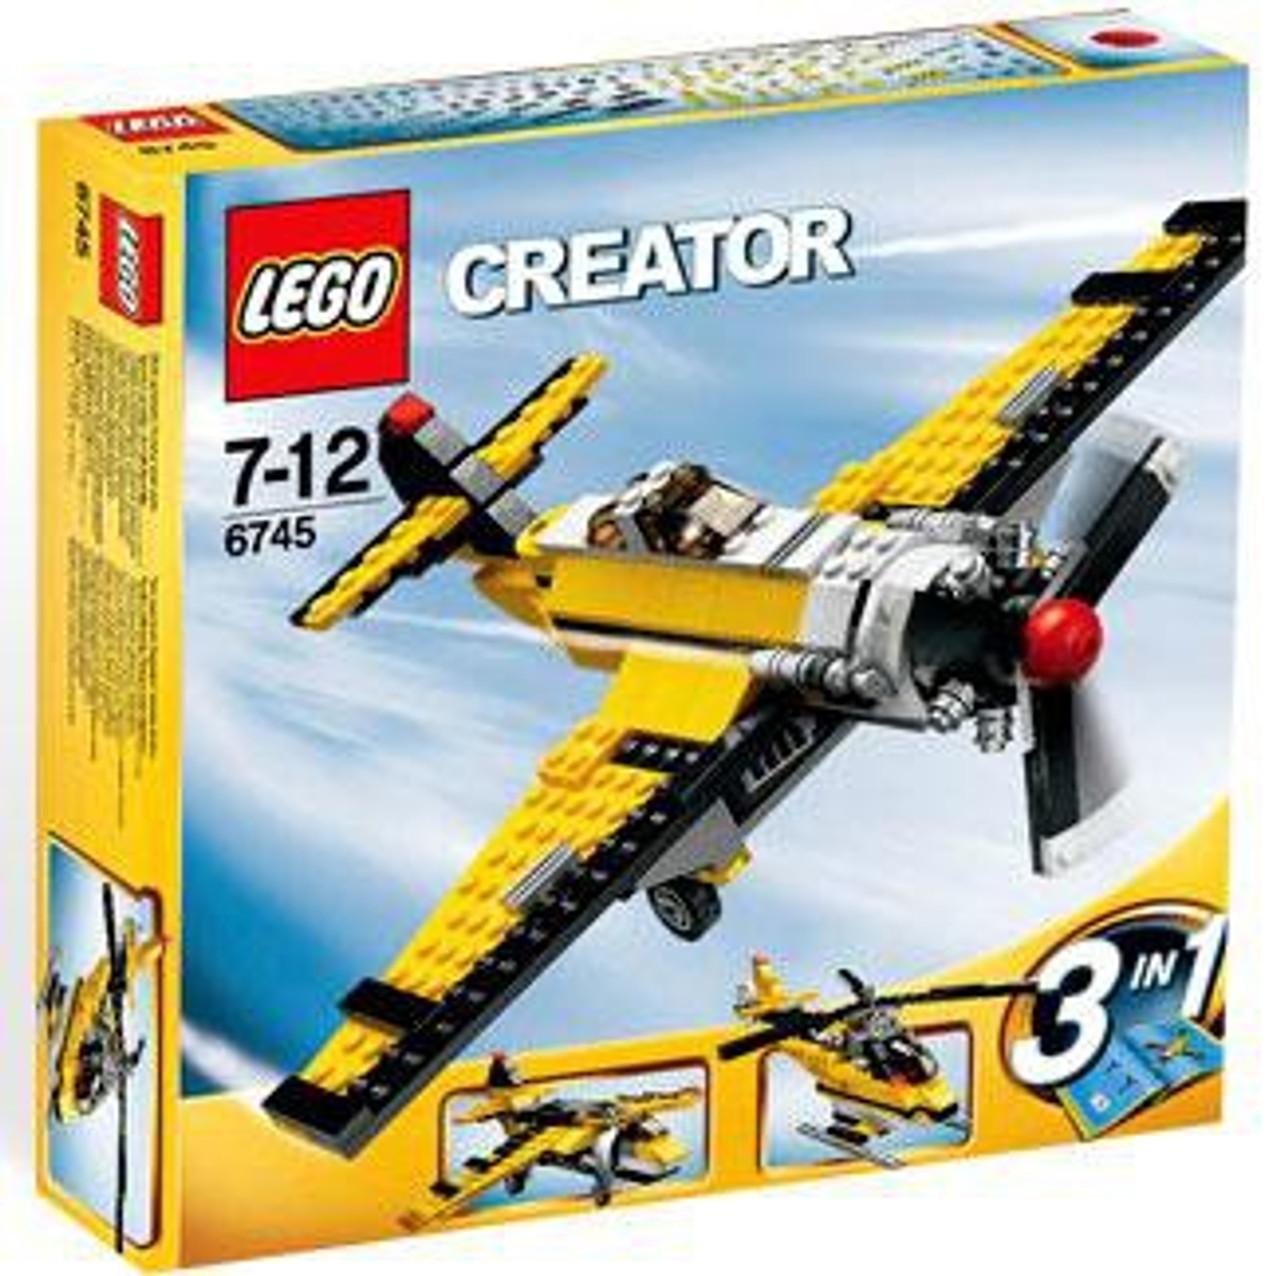 LEGO Creator Propeller Power Set #6745